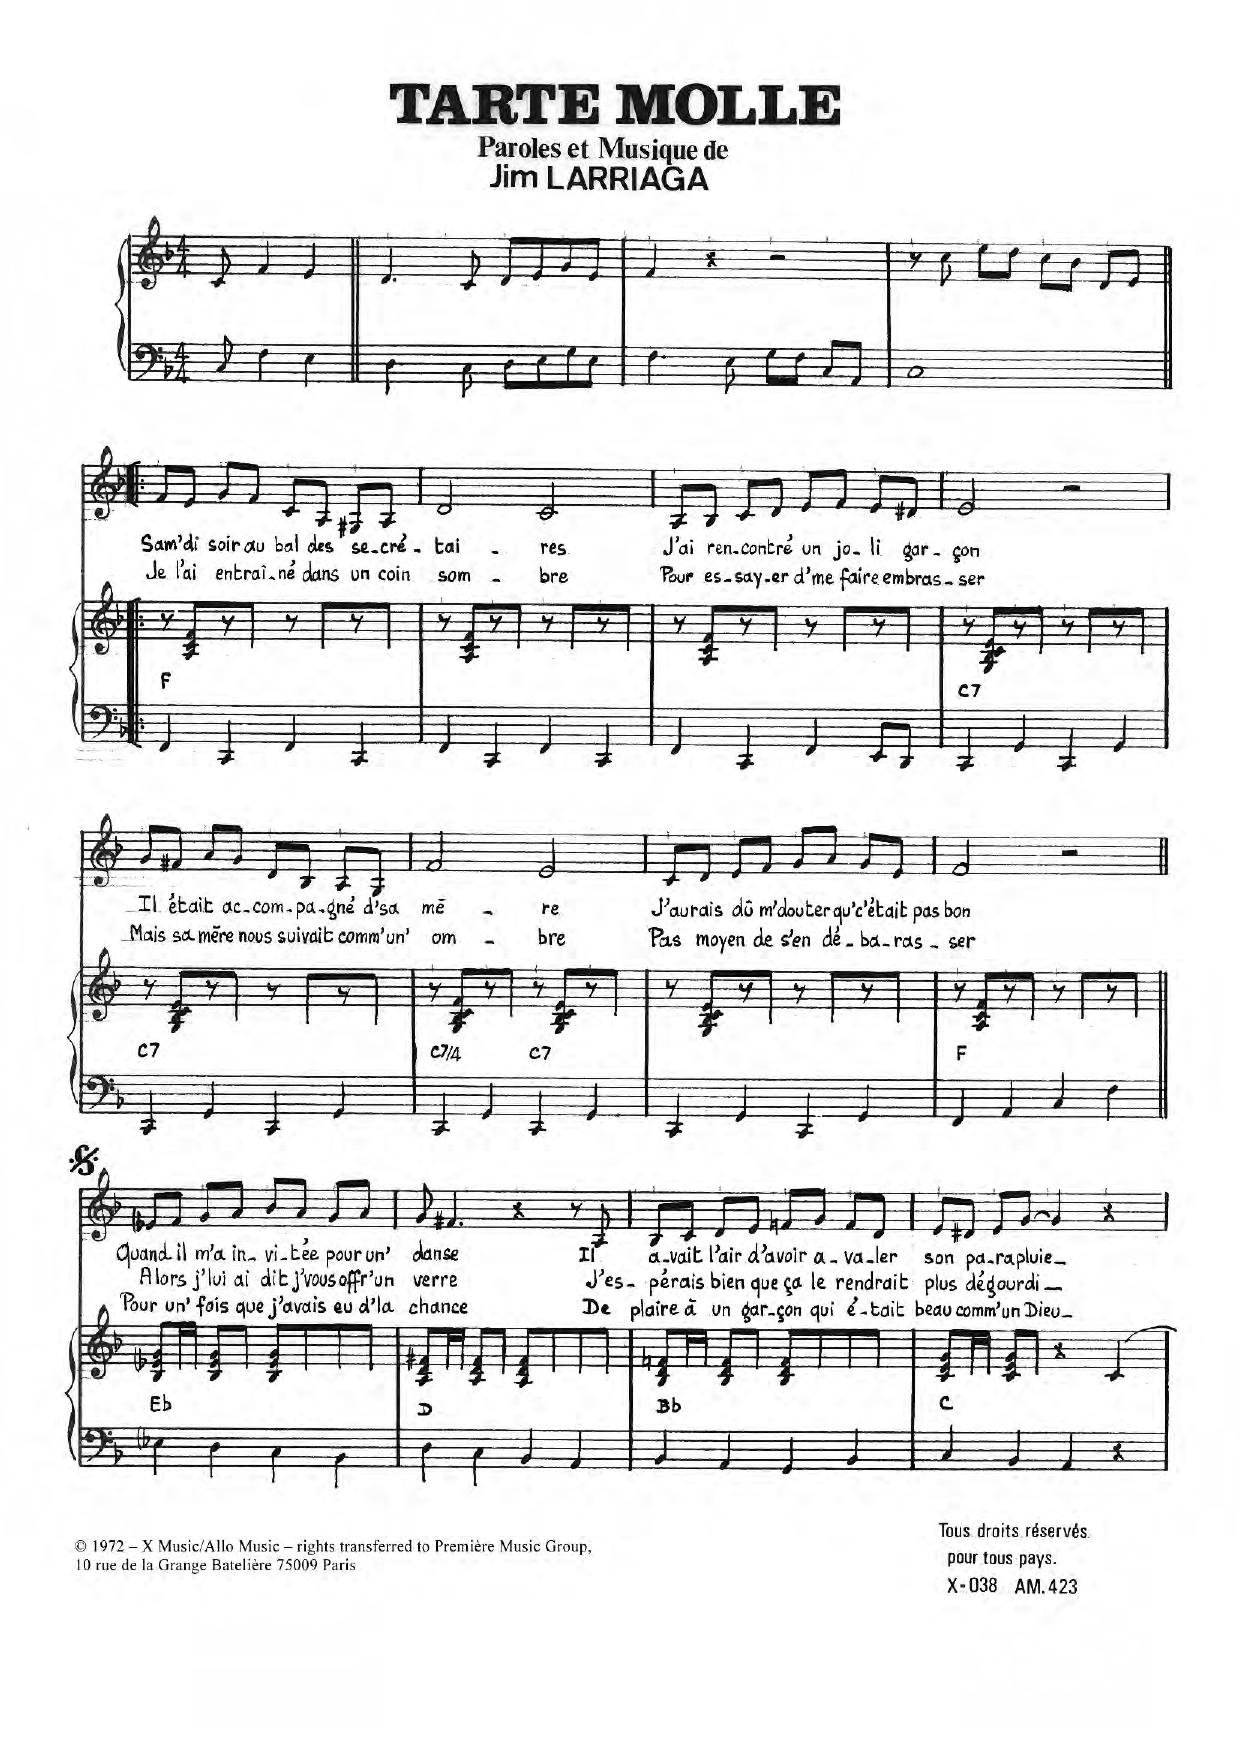 Tarte Molle Sheet Music